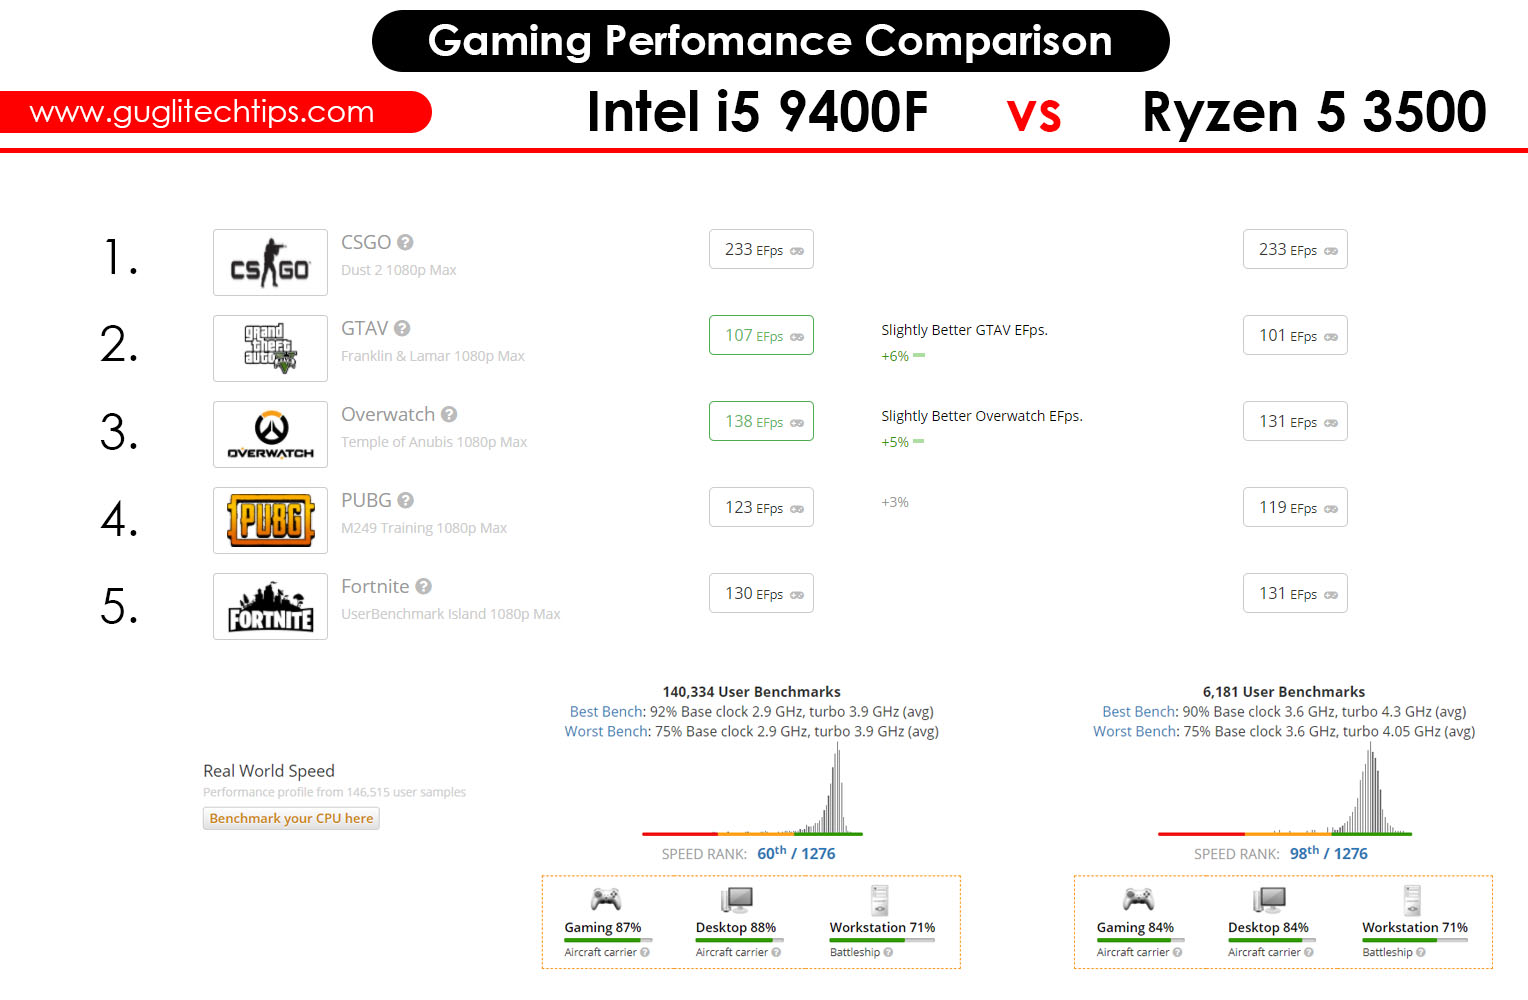 Intel i5 9400F vs AMD Ryzen 5 Processor Gaming Performance